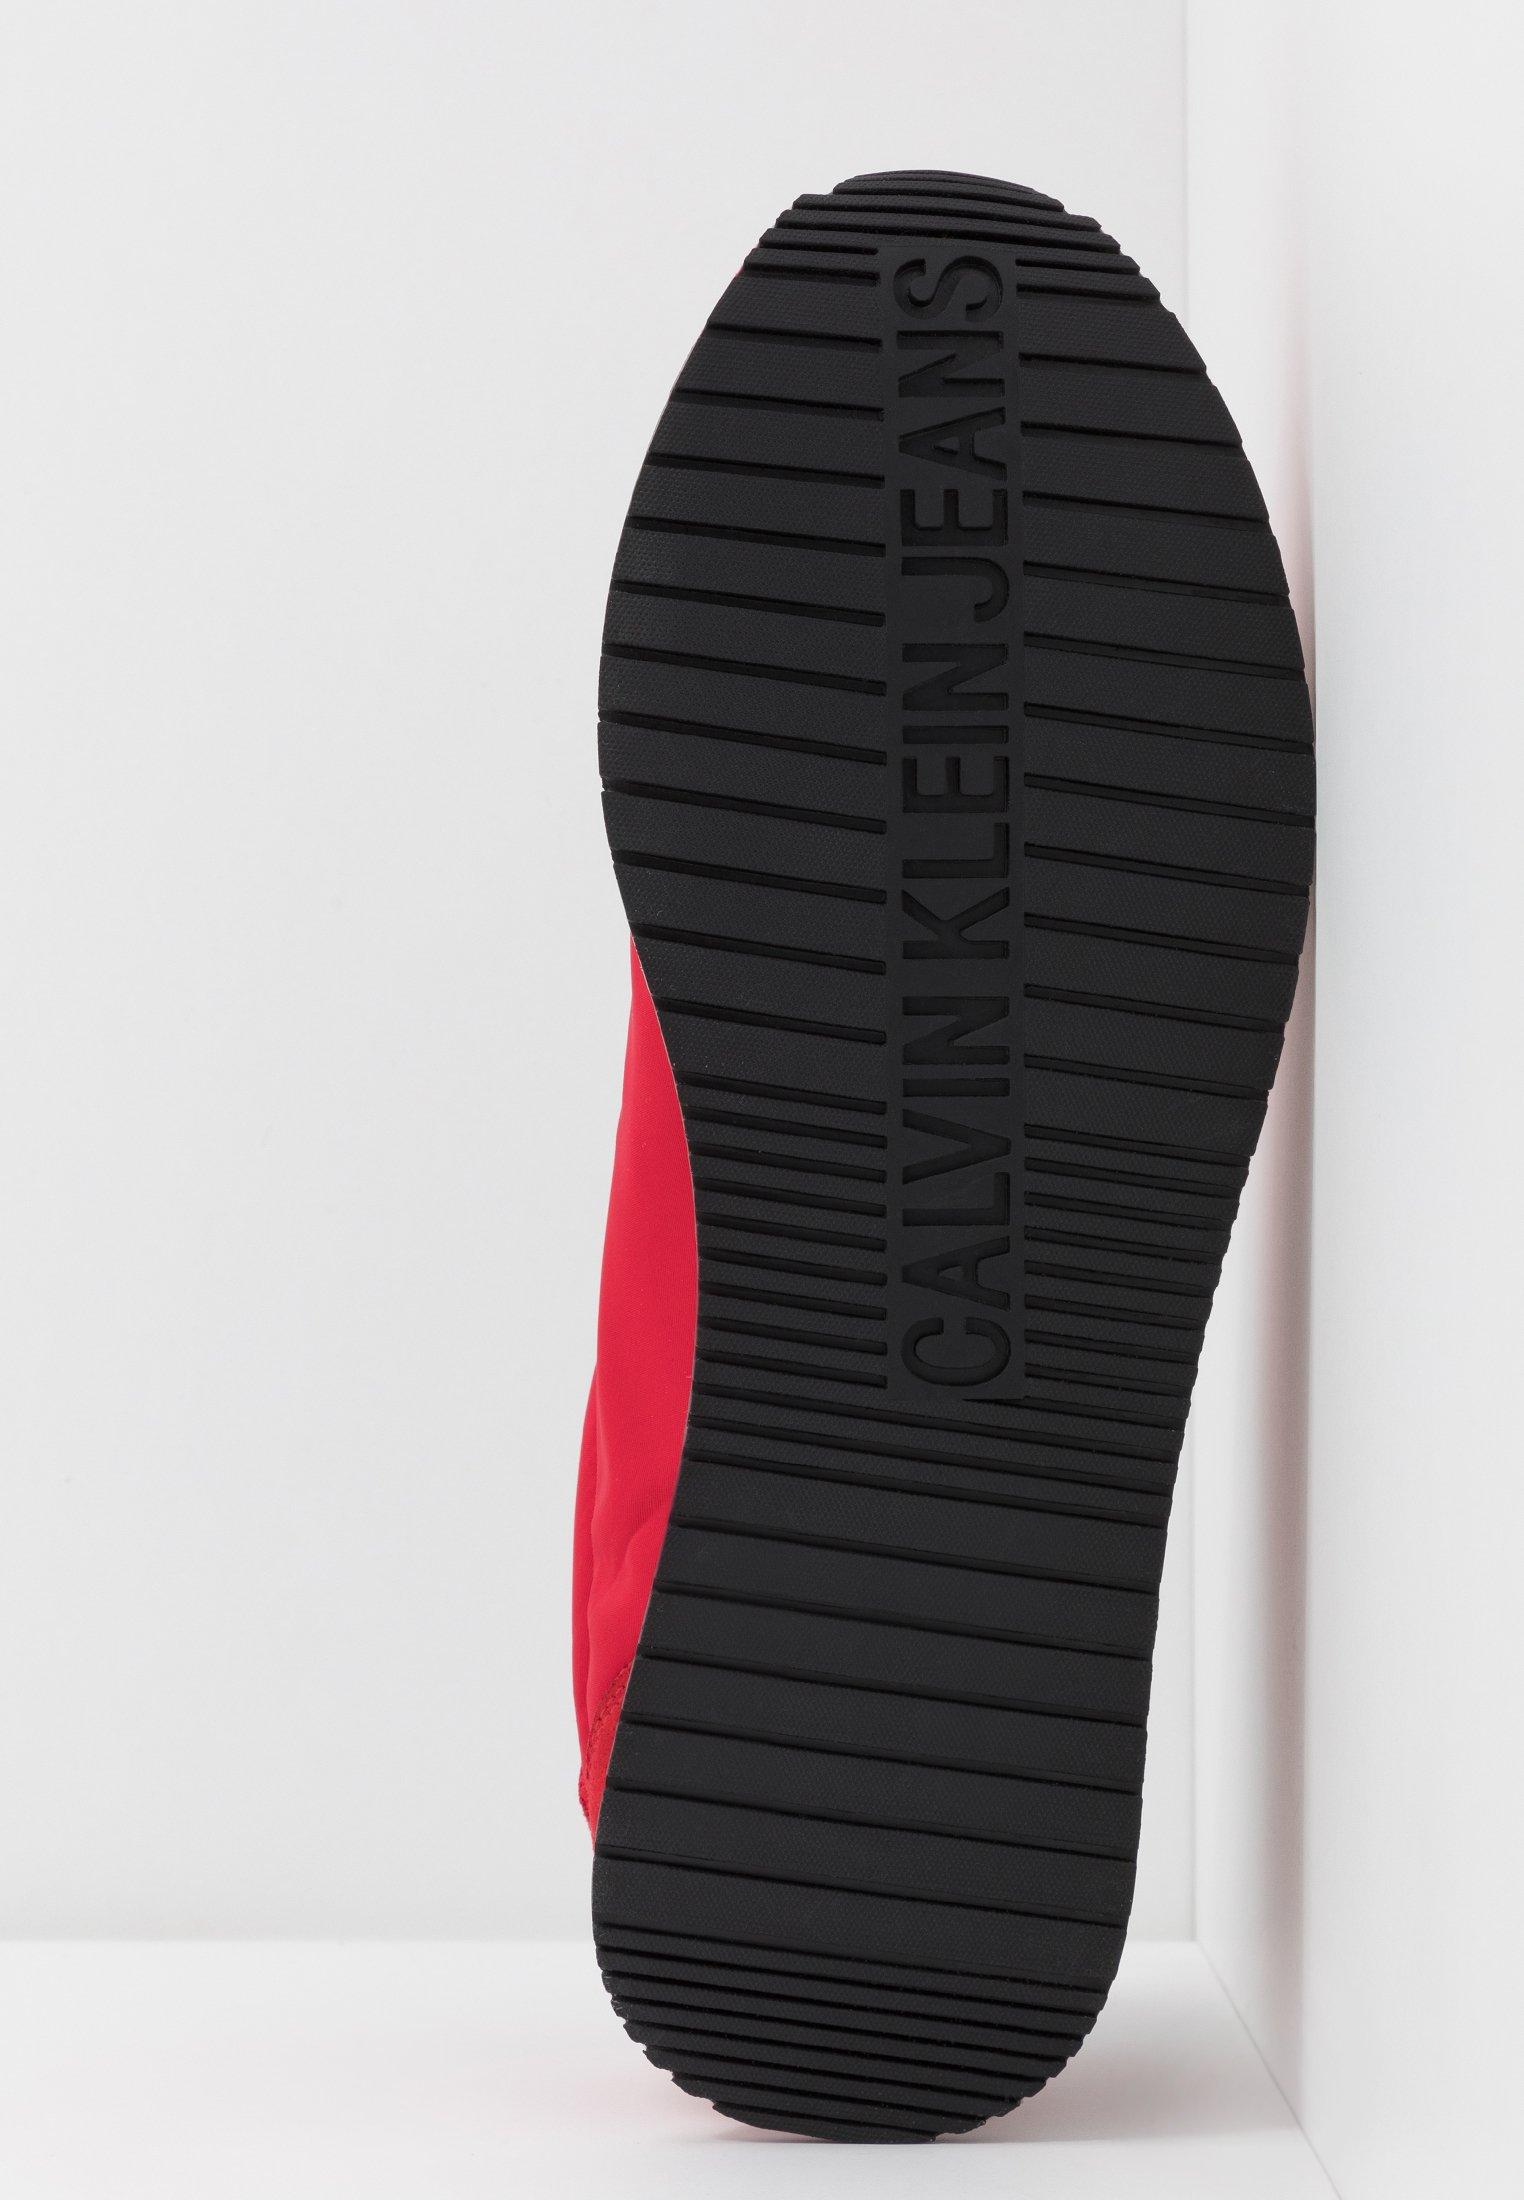 Calvin JEMMYBaskets red Jeans basses racing Klein R3jL54A